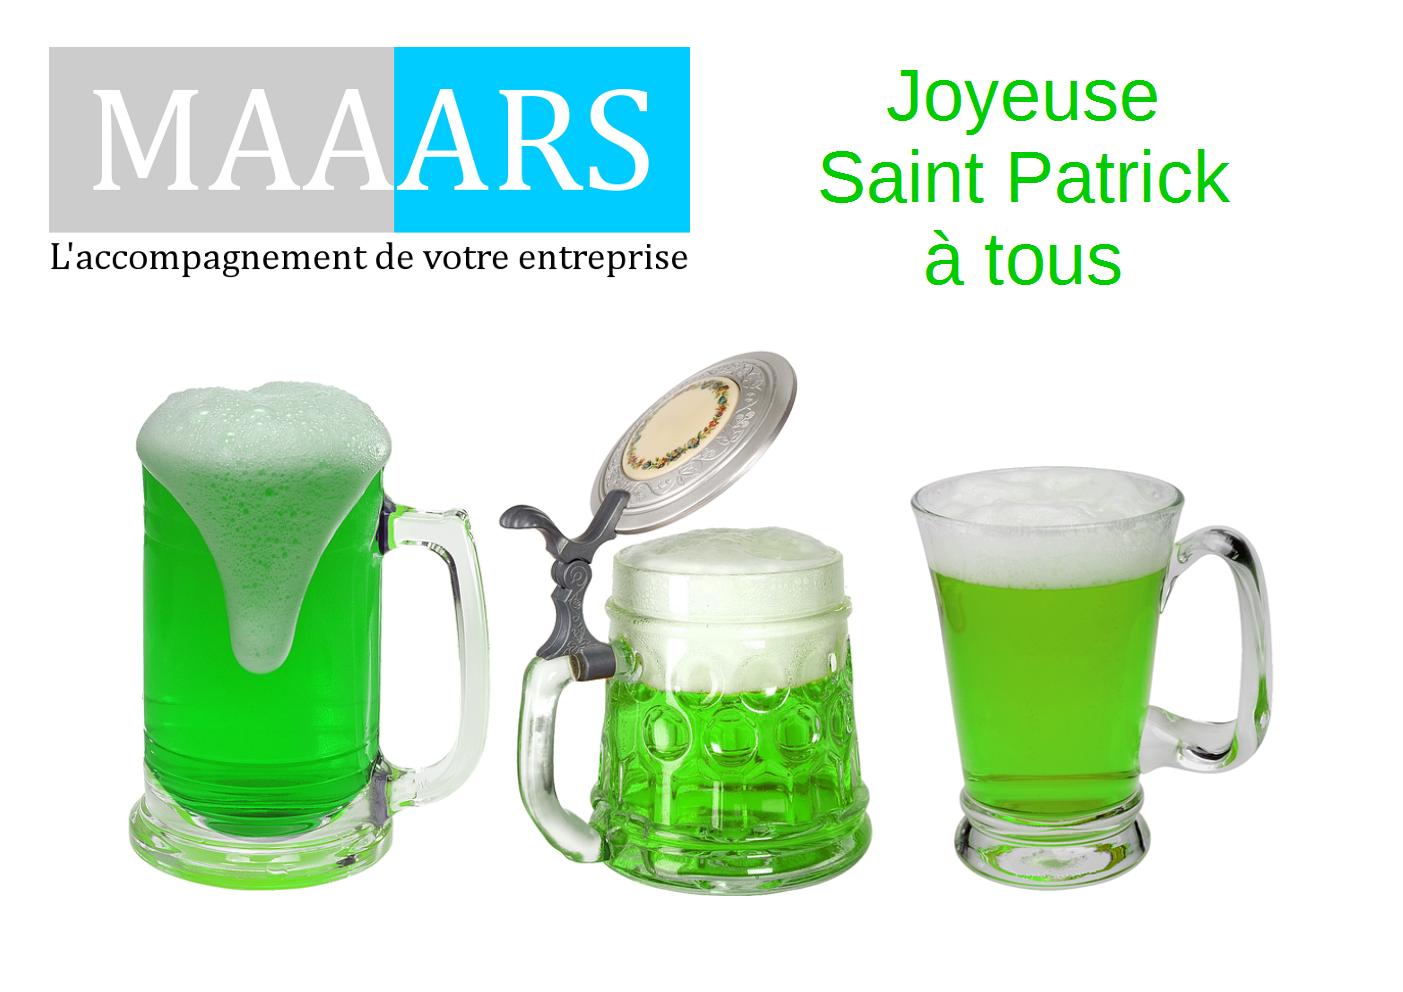 Joyeuse Saint Patrick à tous